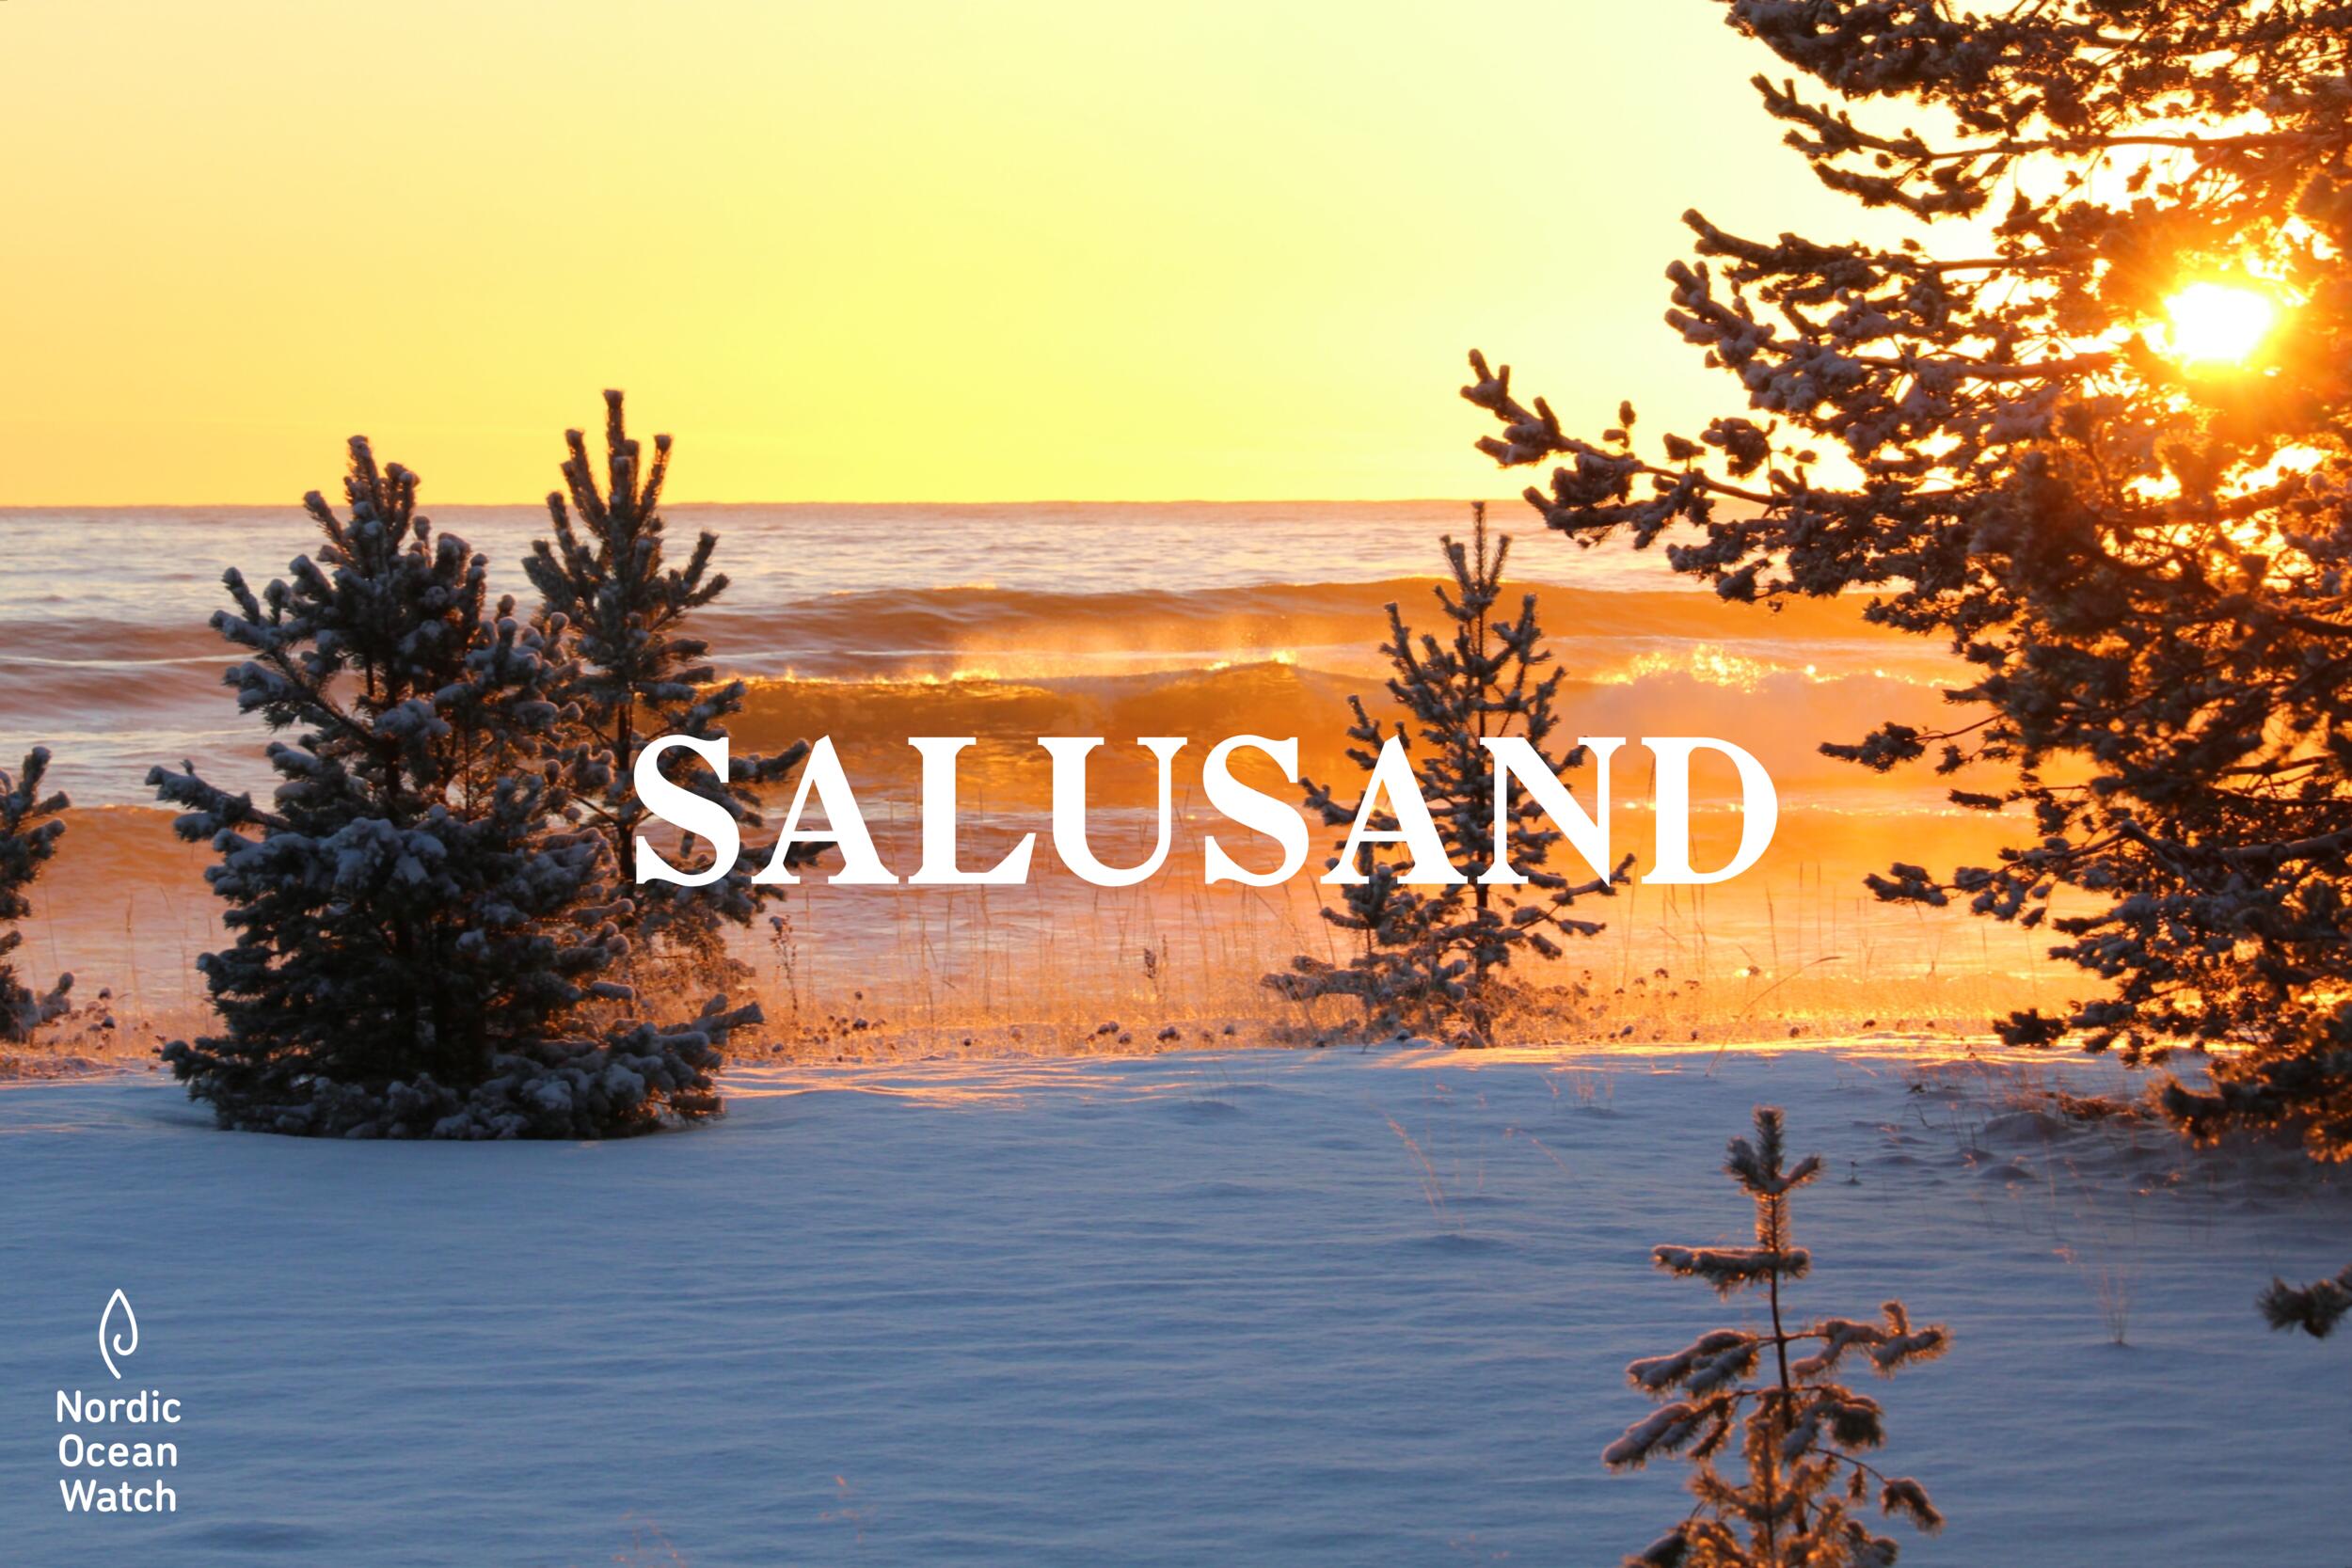 Salusand_JohanSilvernord.png